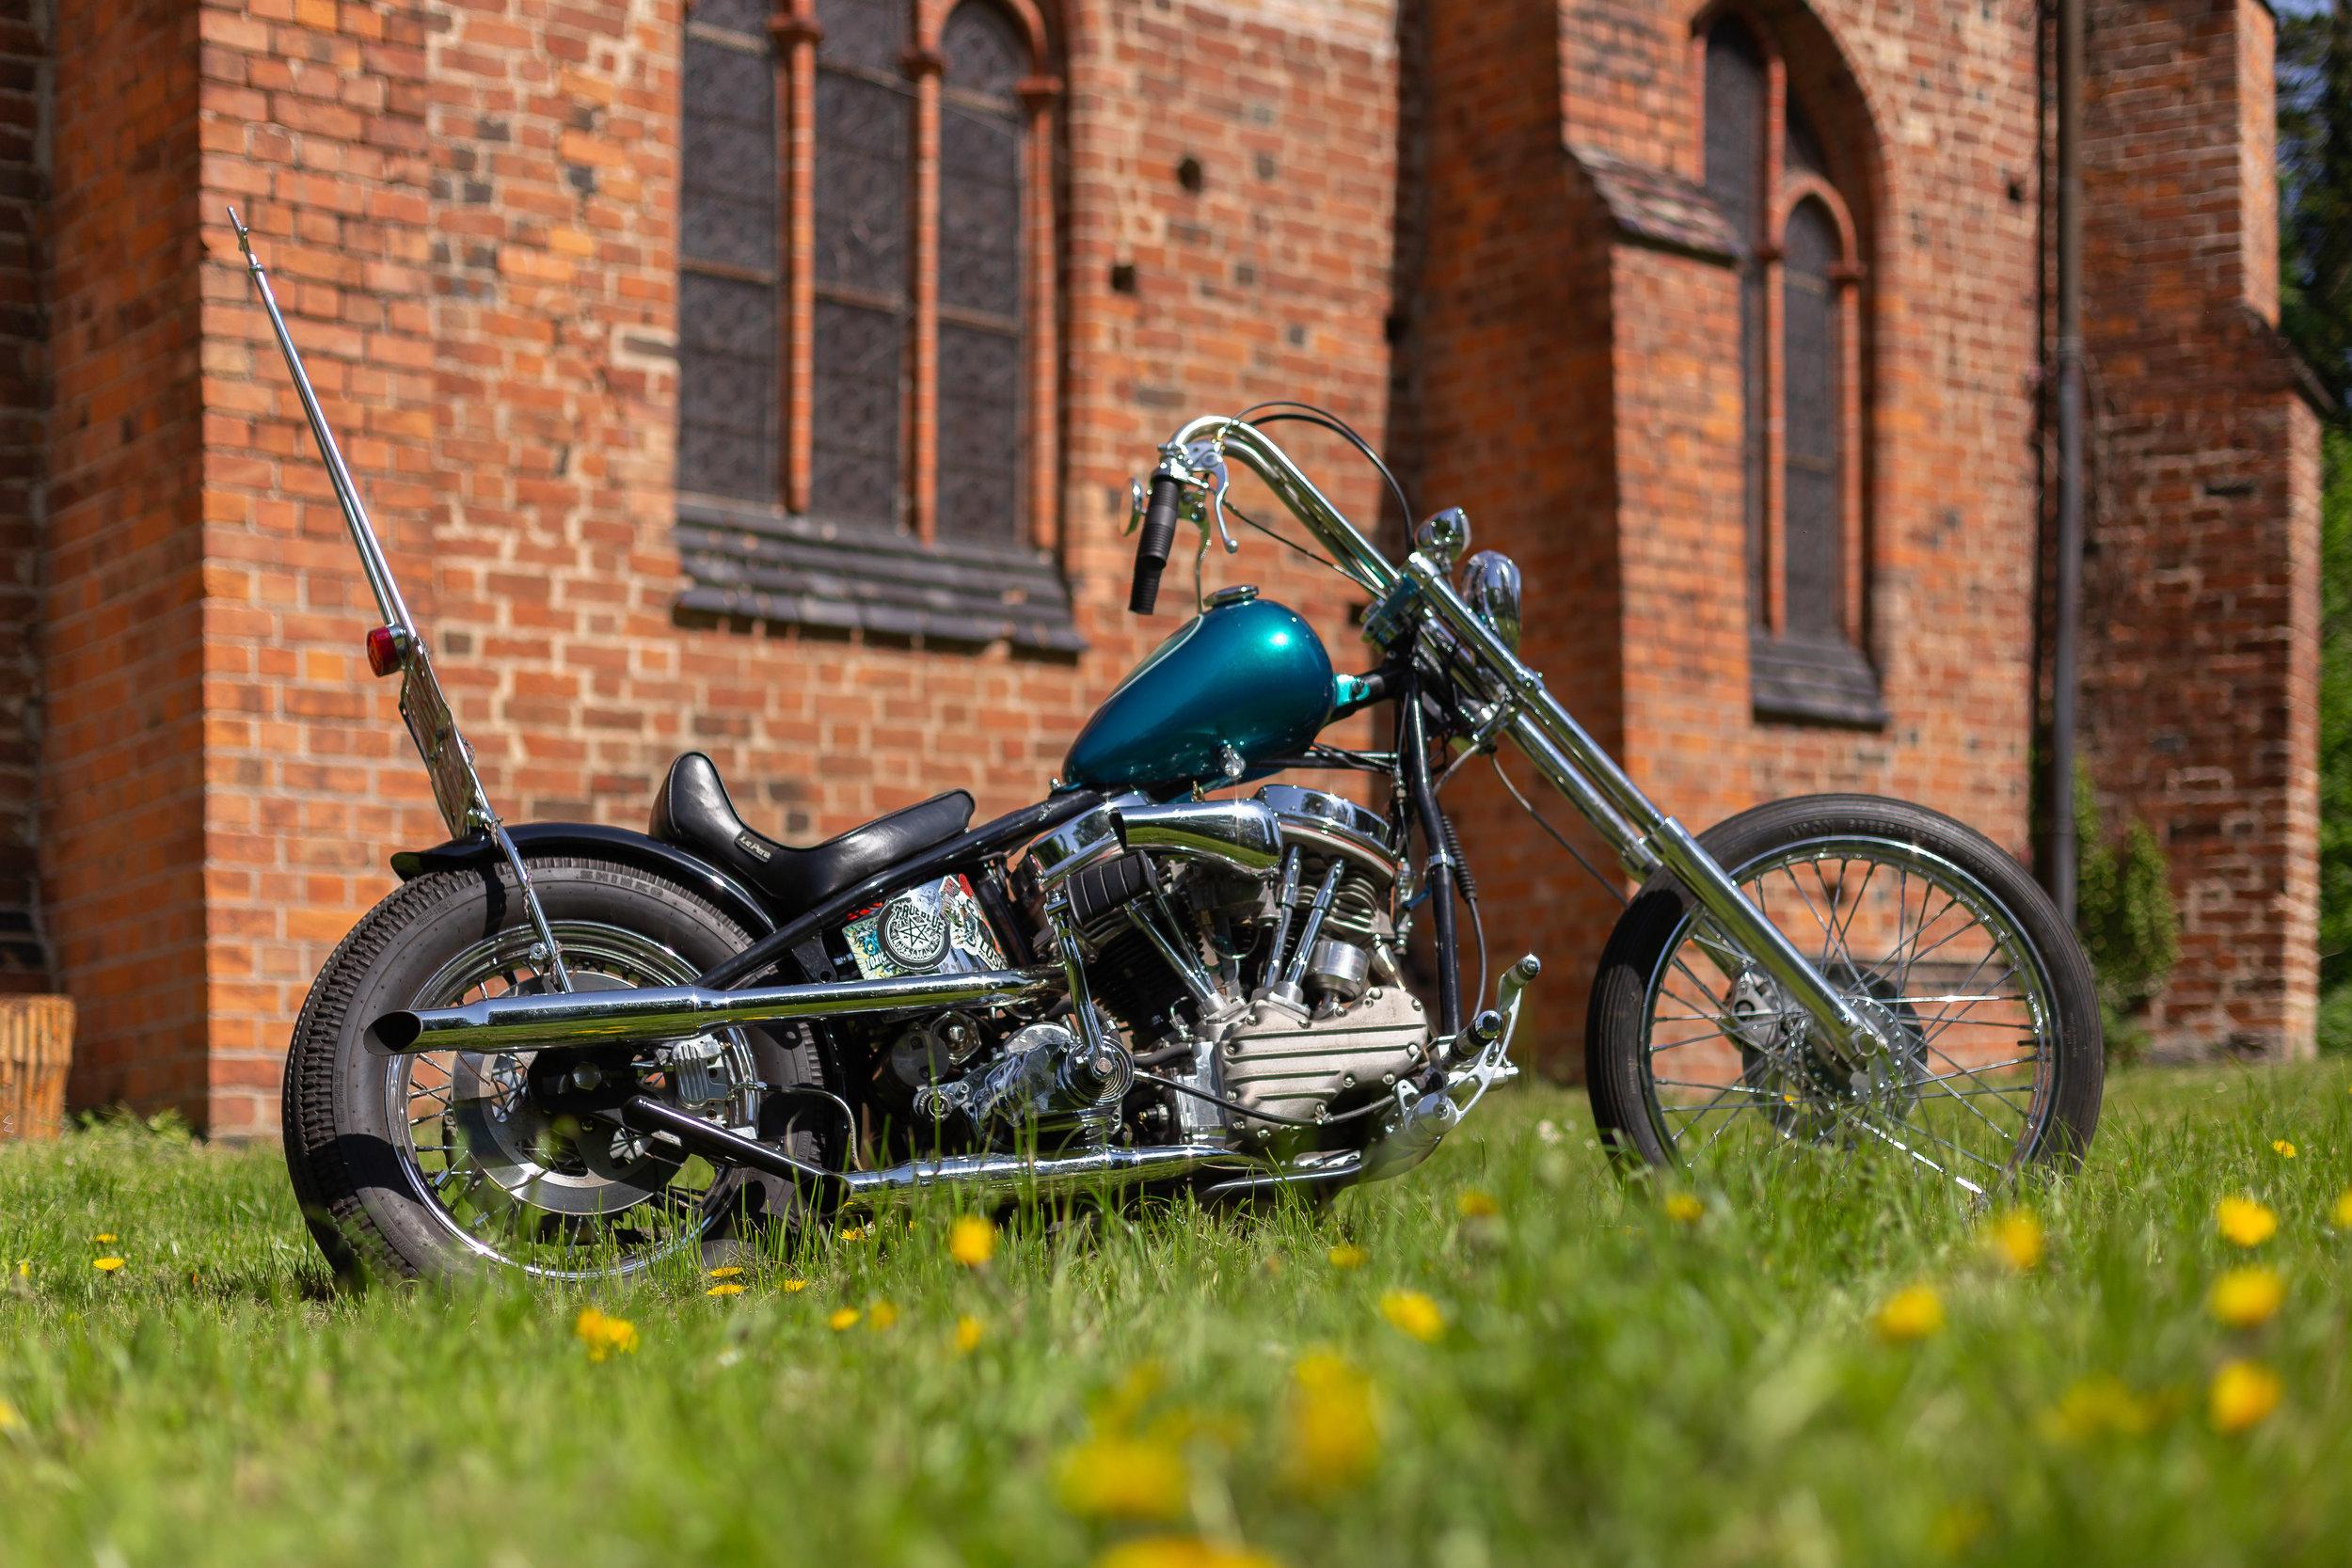 (c) Stefan Weidner Fotografie_Toxic Bikes_Karls Ofen_10-05-2018_IMG-0128.jpg